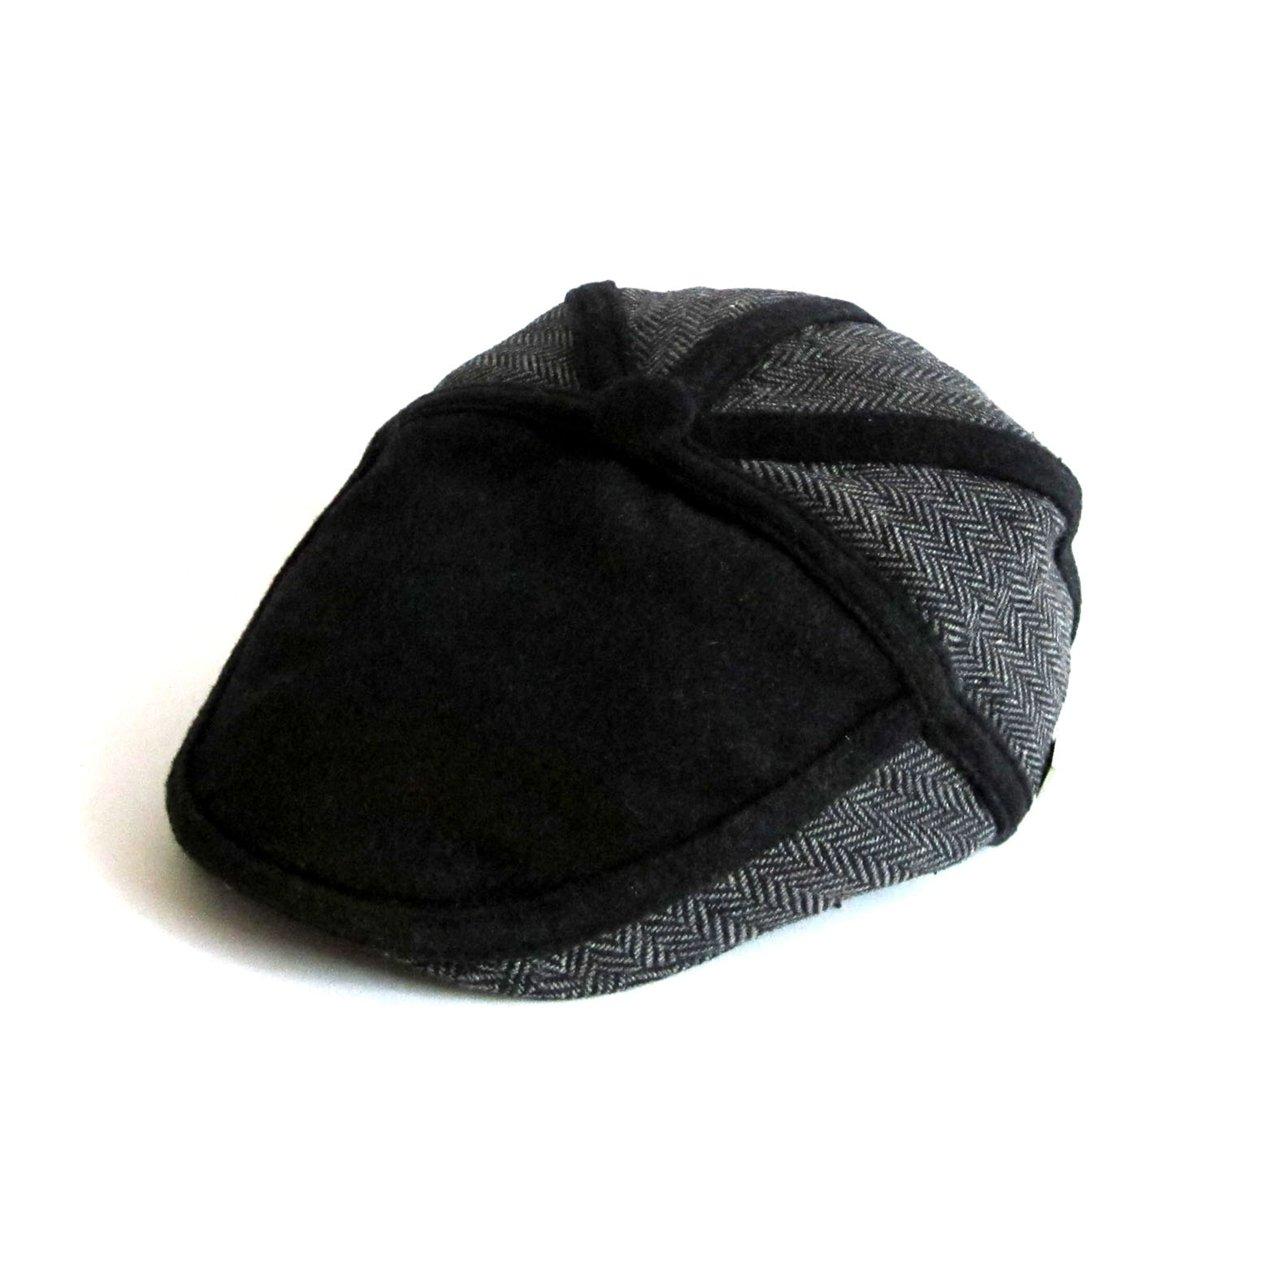 Dasmarca Roy flat cap in Slate - side